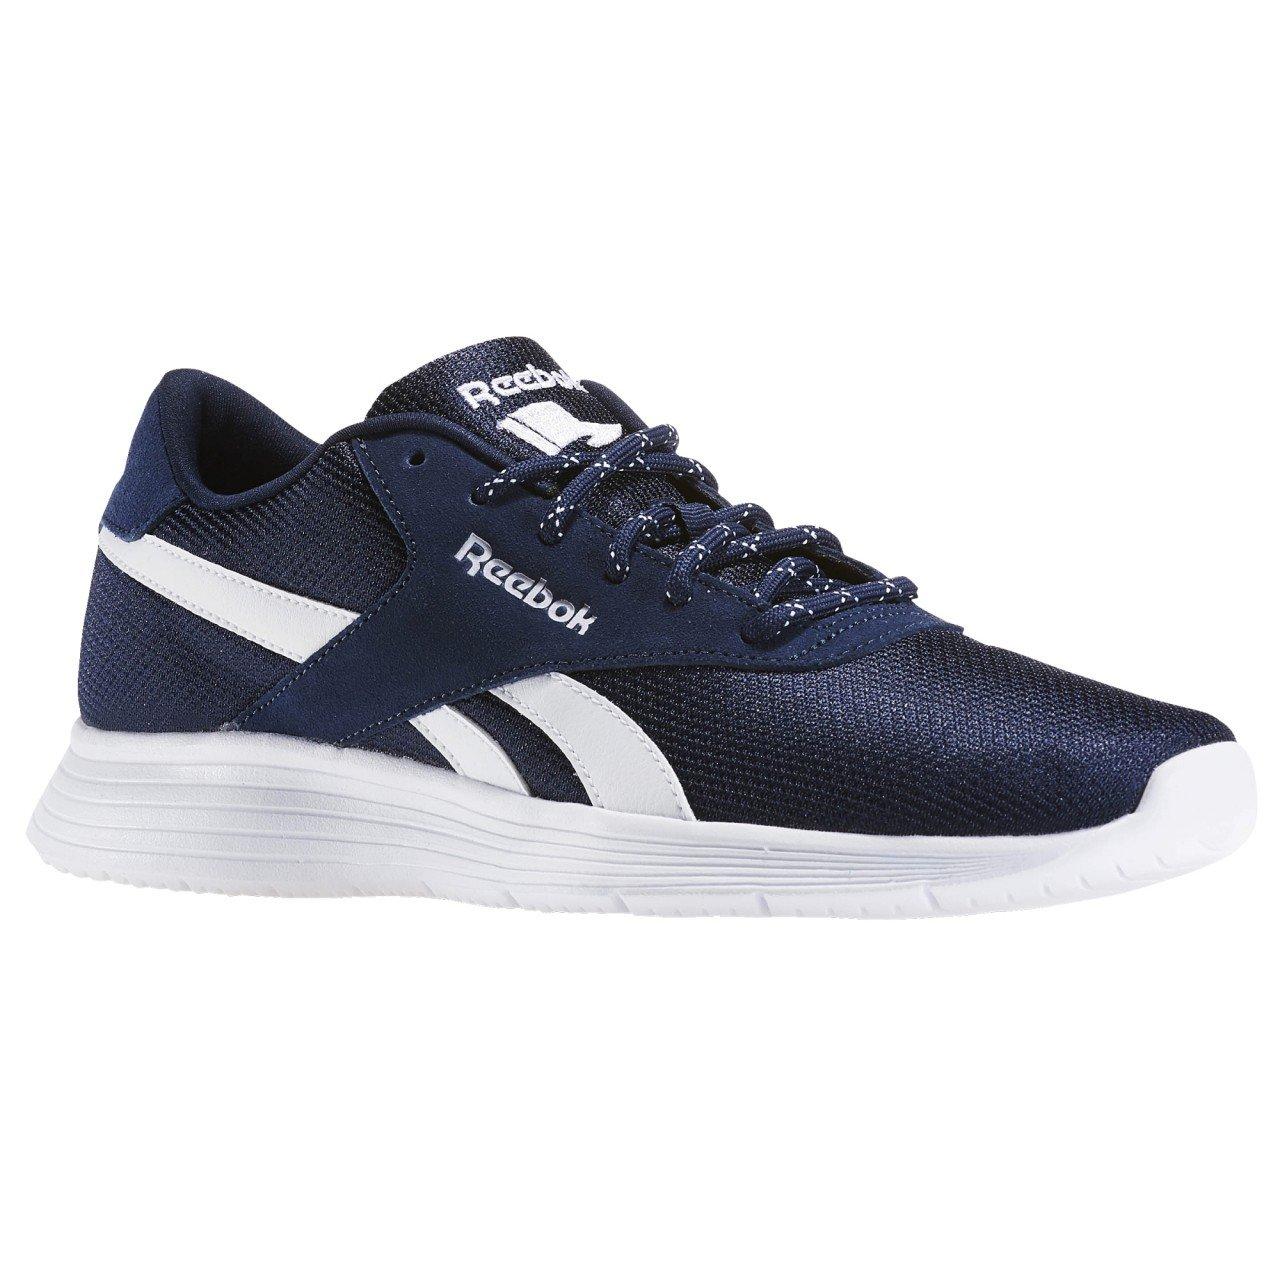 Reebok Royal EC Ride AR2610 Mens Navy Blue Shoes  Amazon.co.uk ... 1123fd8a2